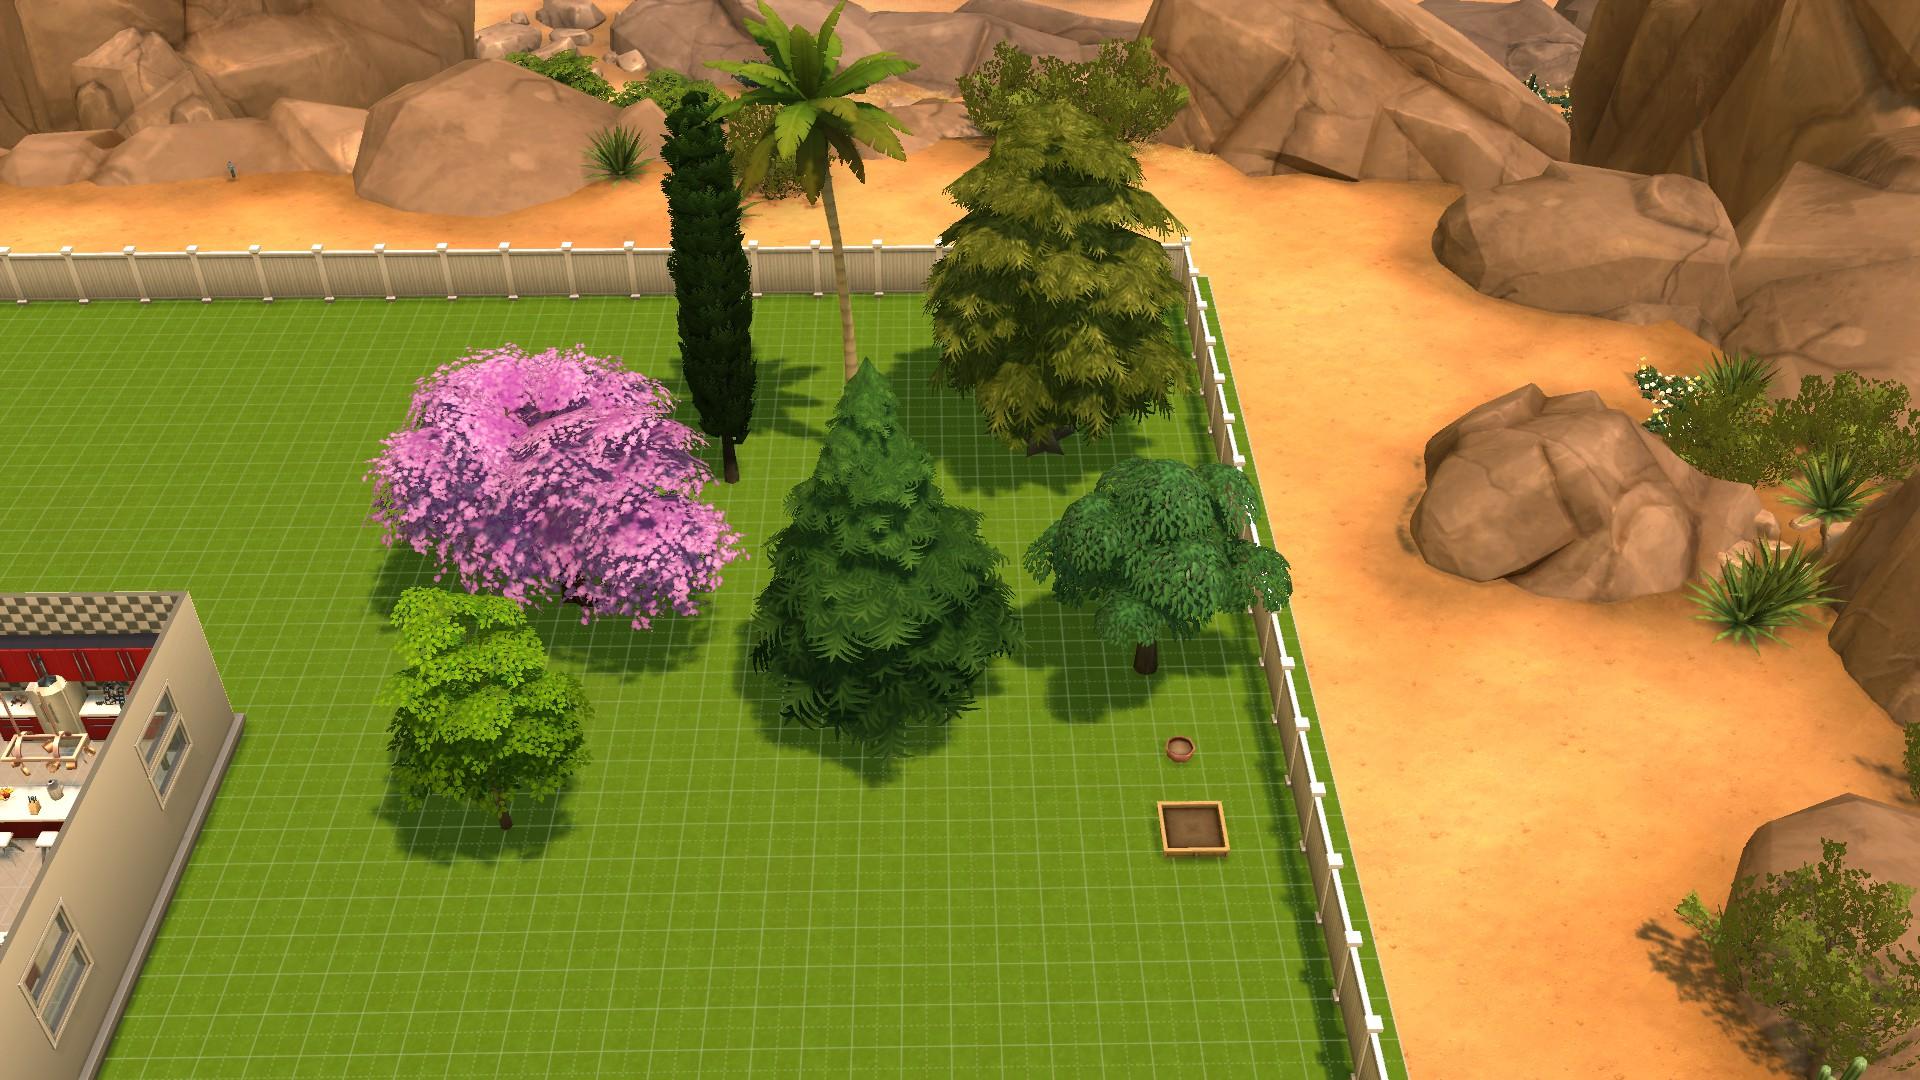 les sims 4 construire sa maison 4 game guide. Black Bedroom Furniture Sets. Home Design Ideas